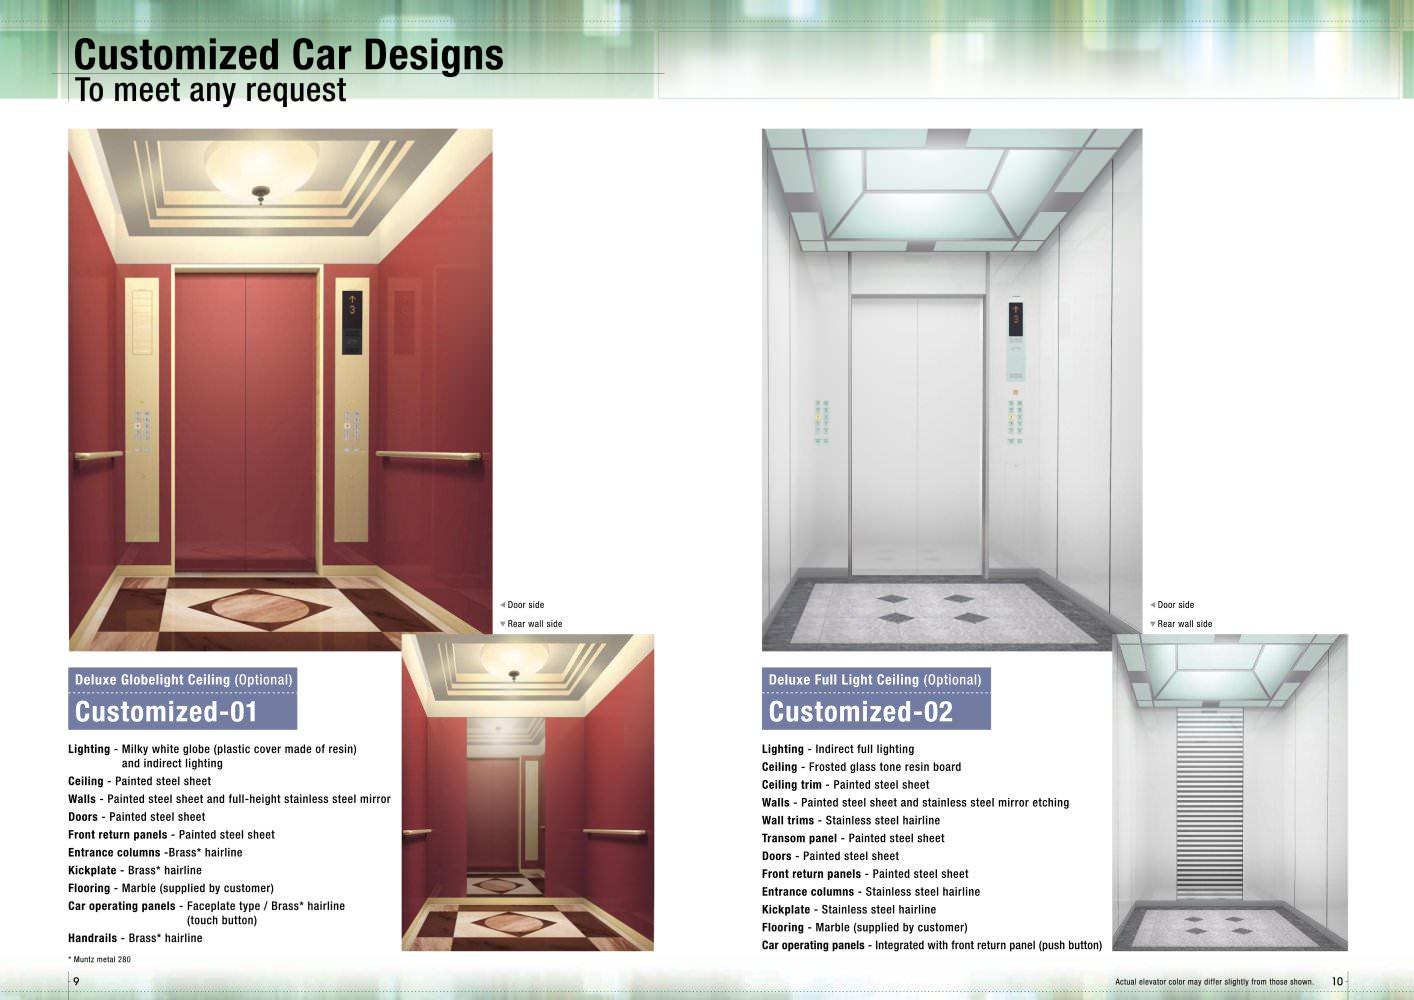 Design of a car pdf - Car Design 1 5 Pages